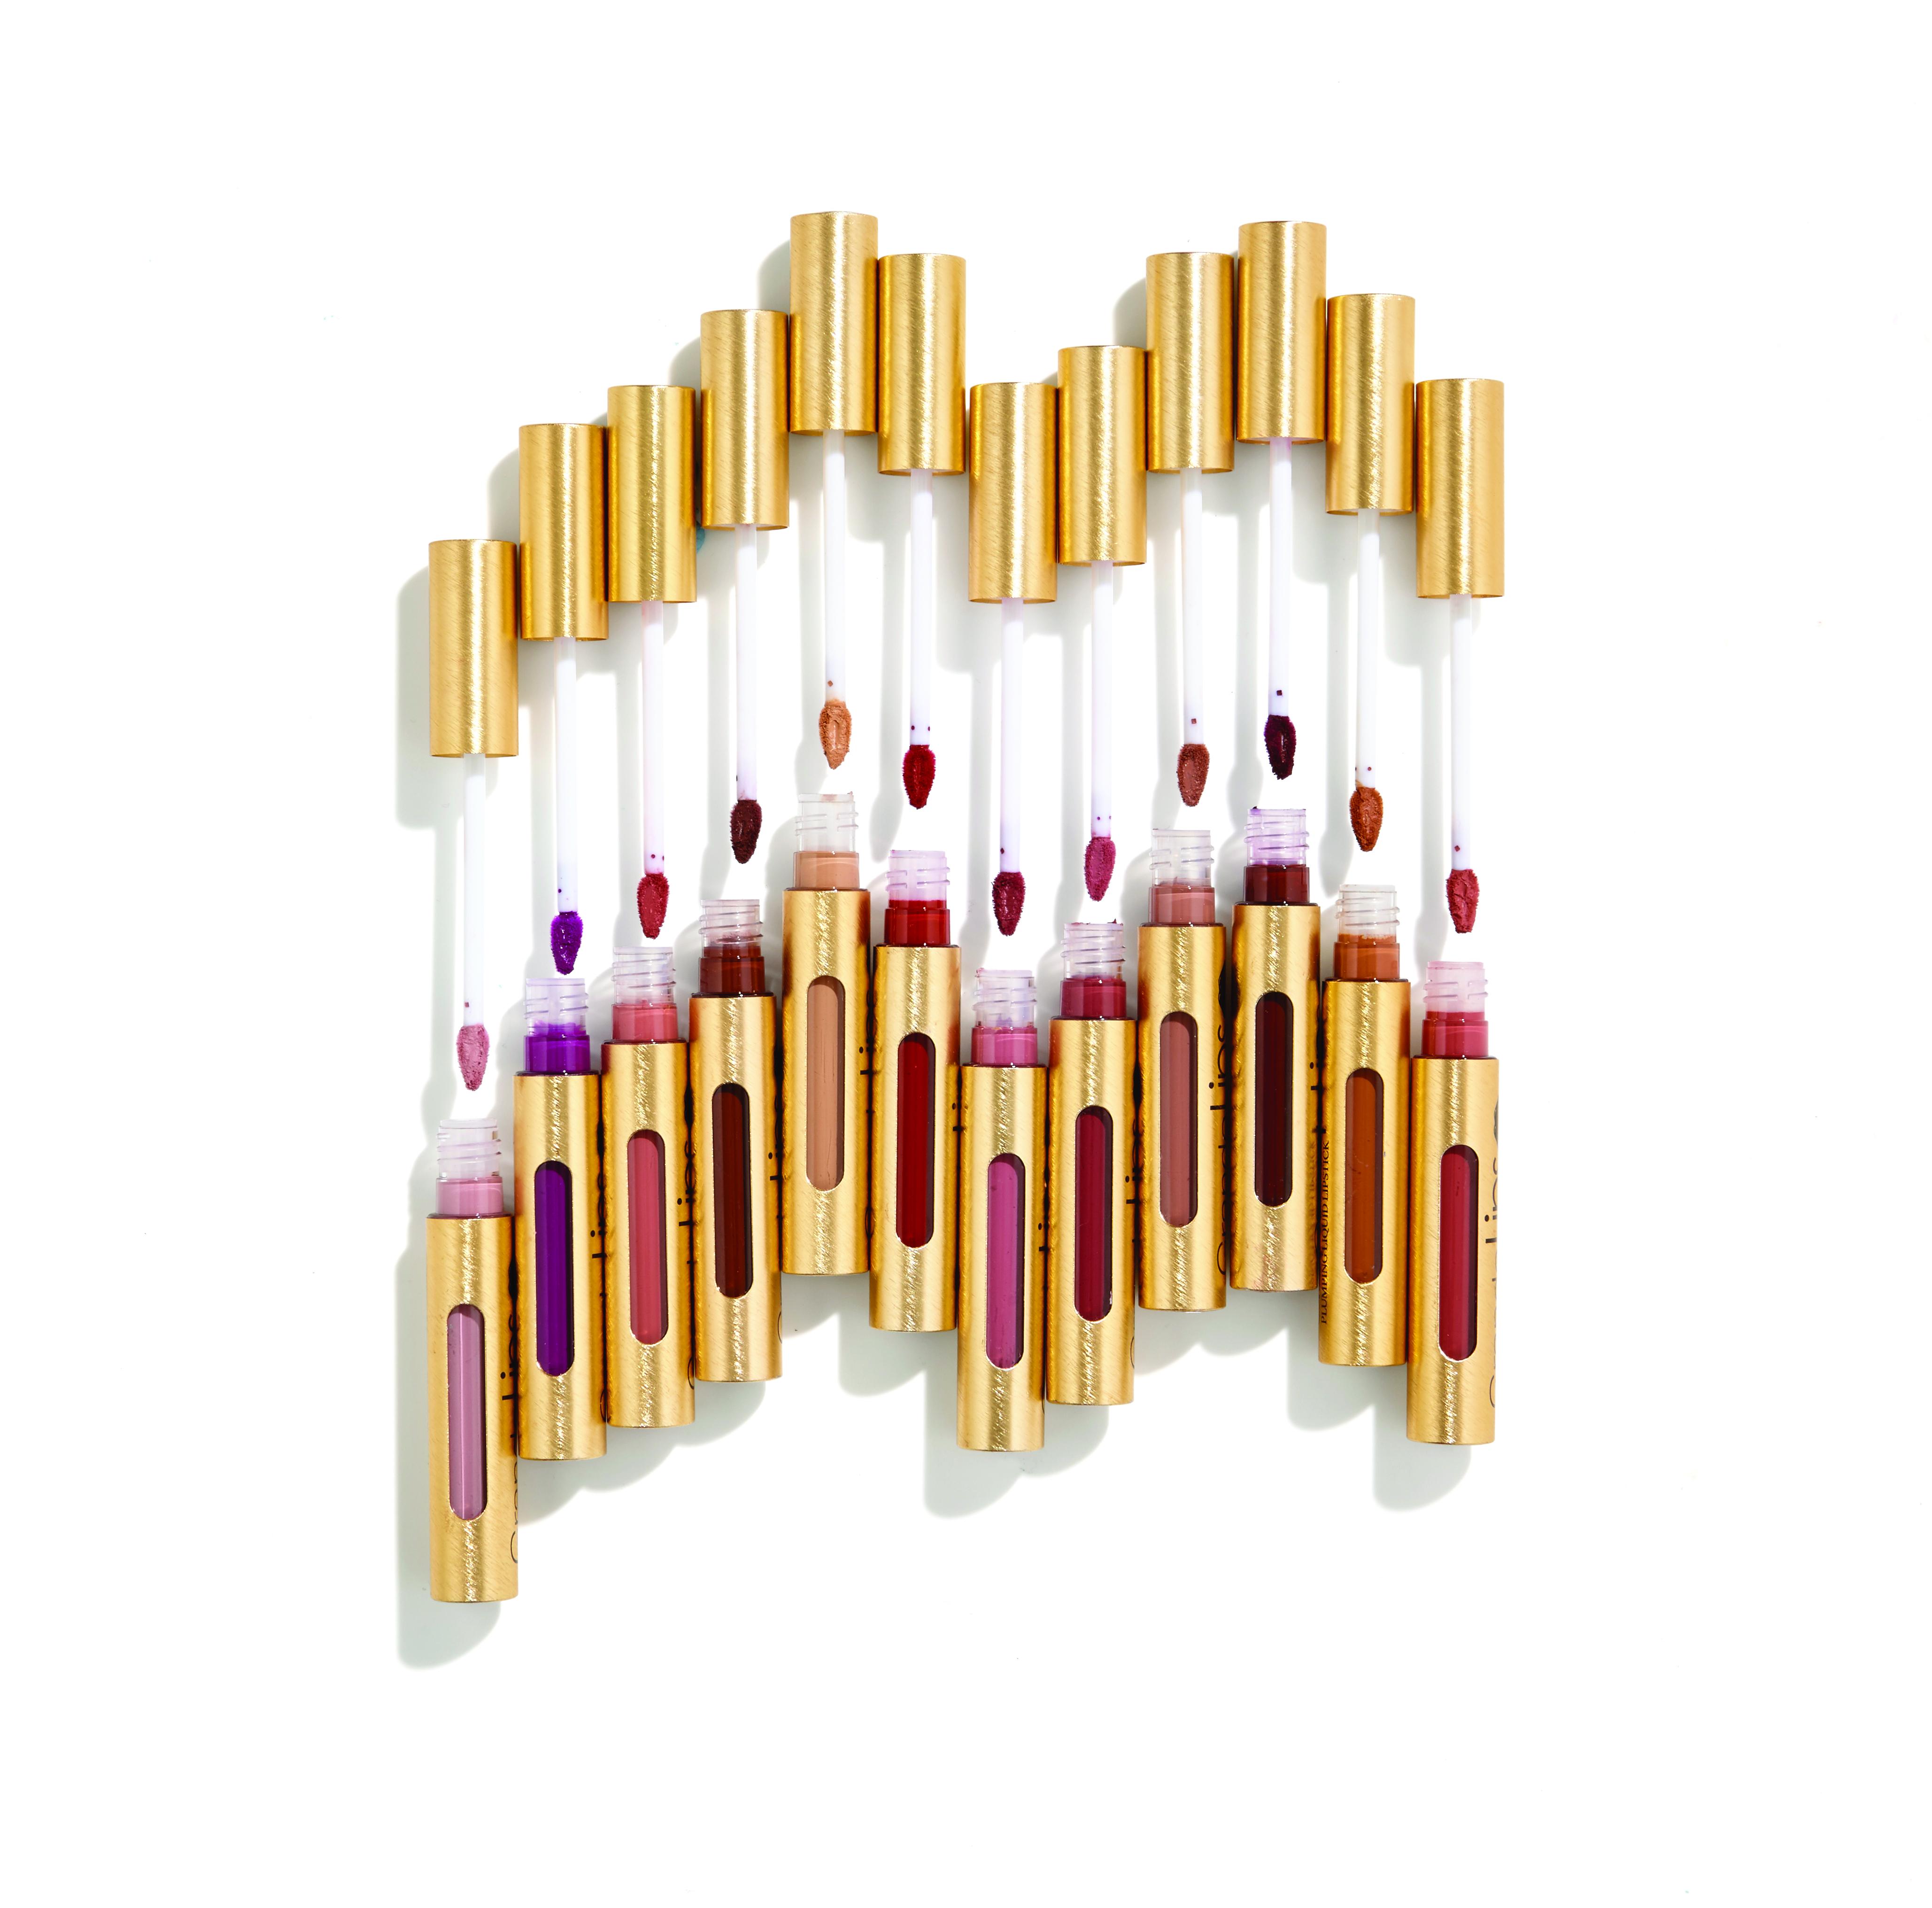 Grande Cosmetics Lip Plumping Liquid Lipstick.